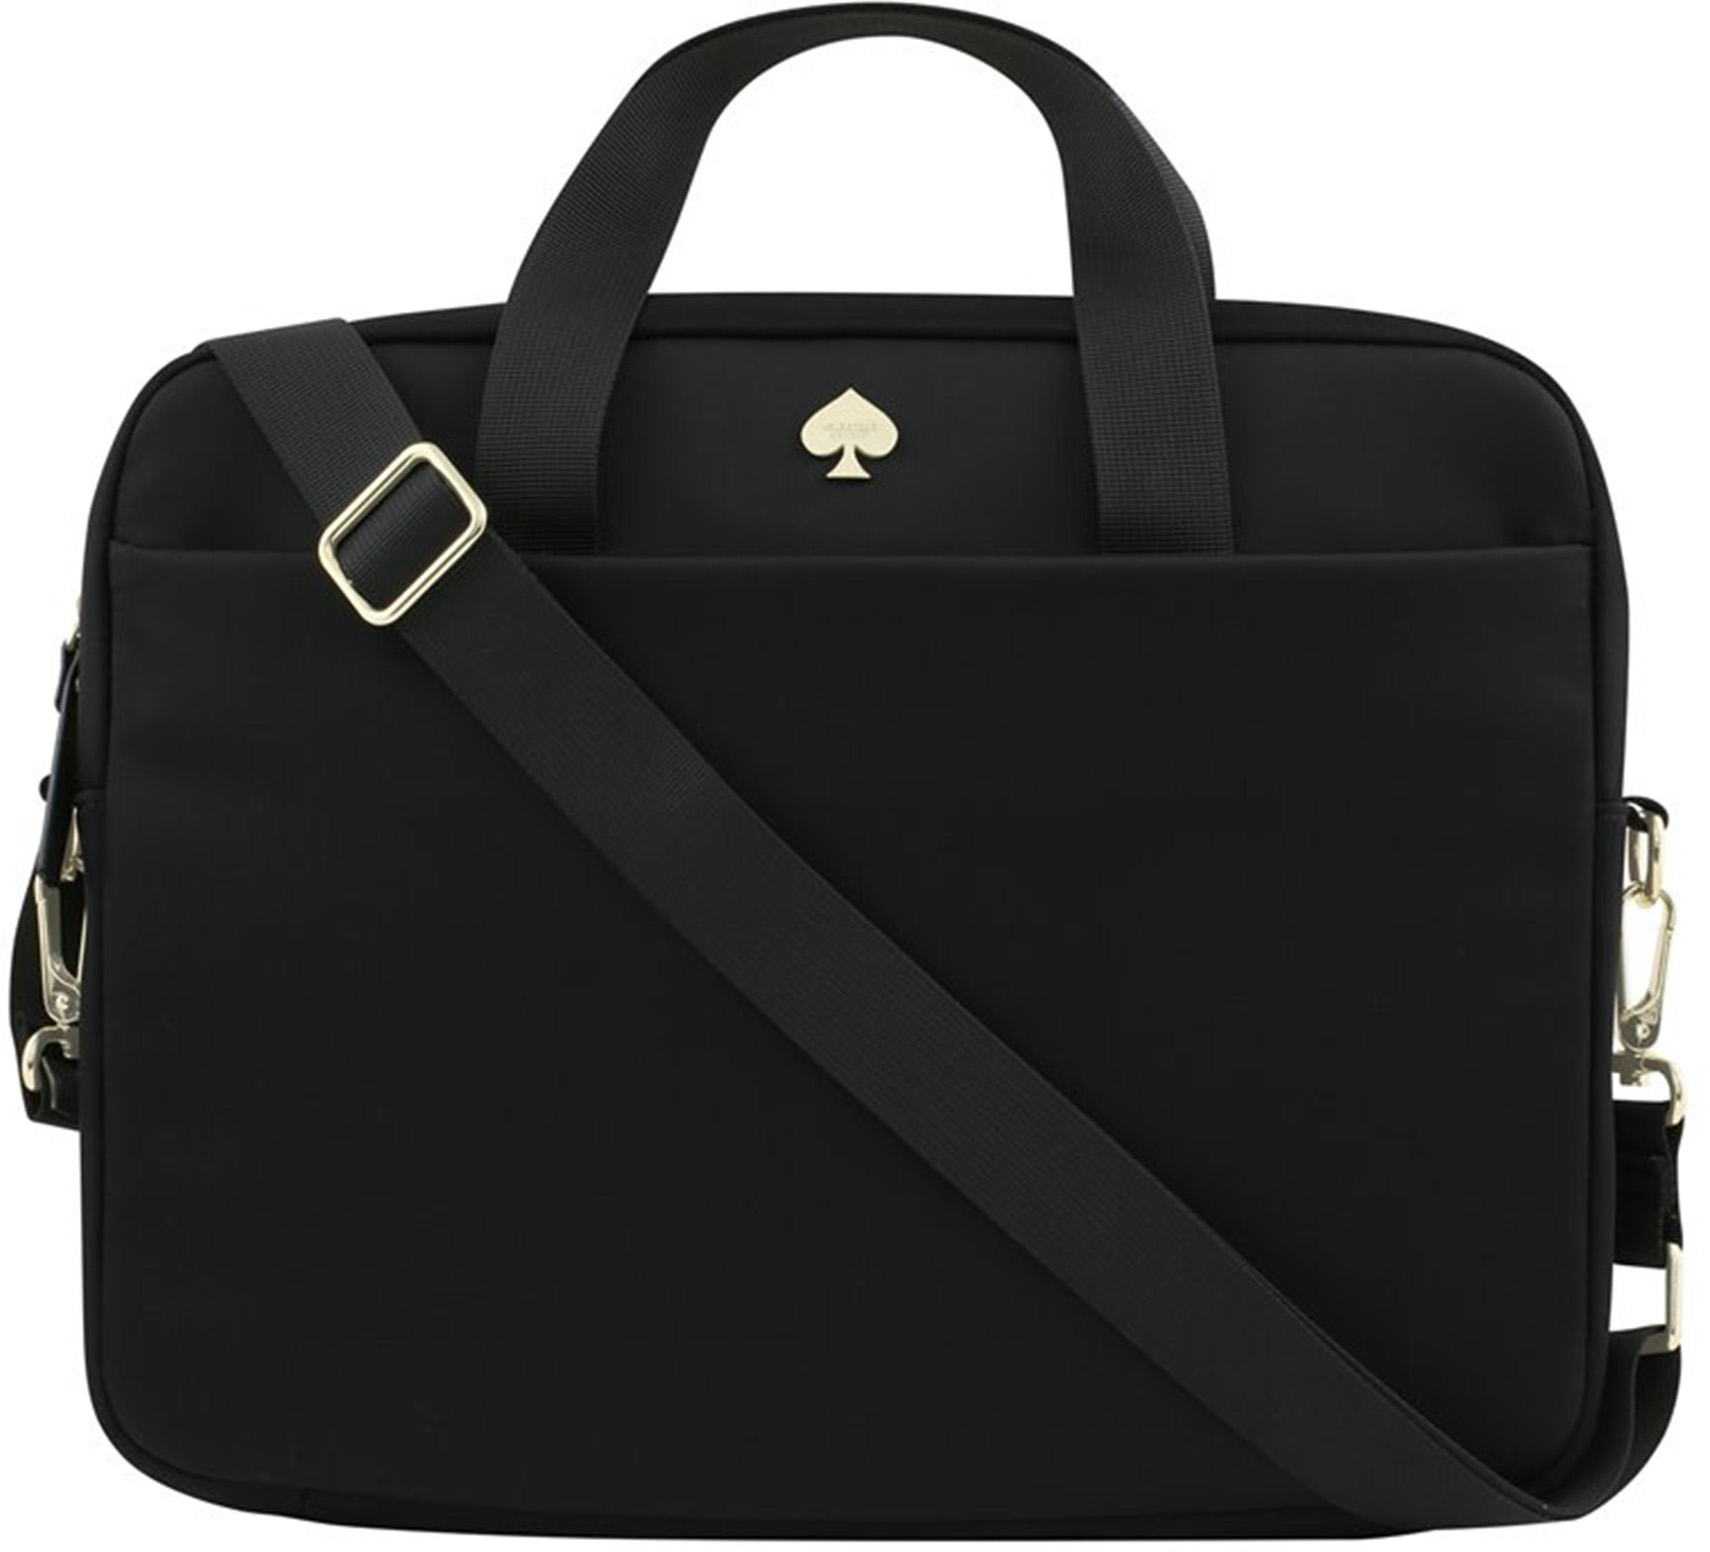 Kate Spade Nylon 13-inch Laptop Bag (Black)